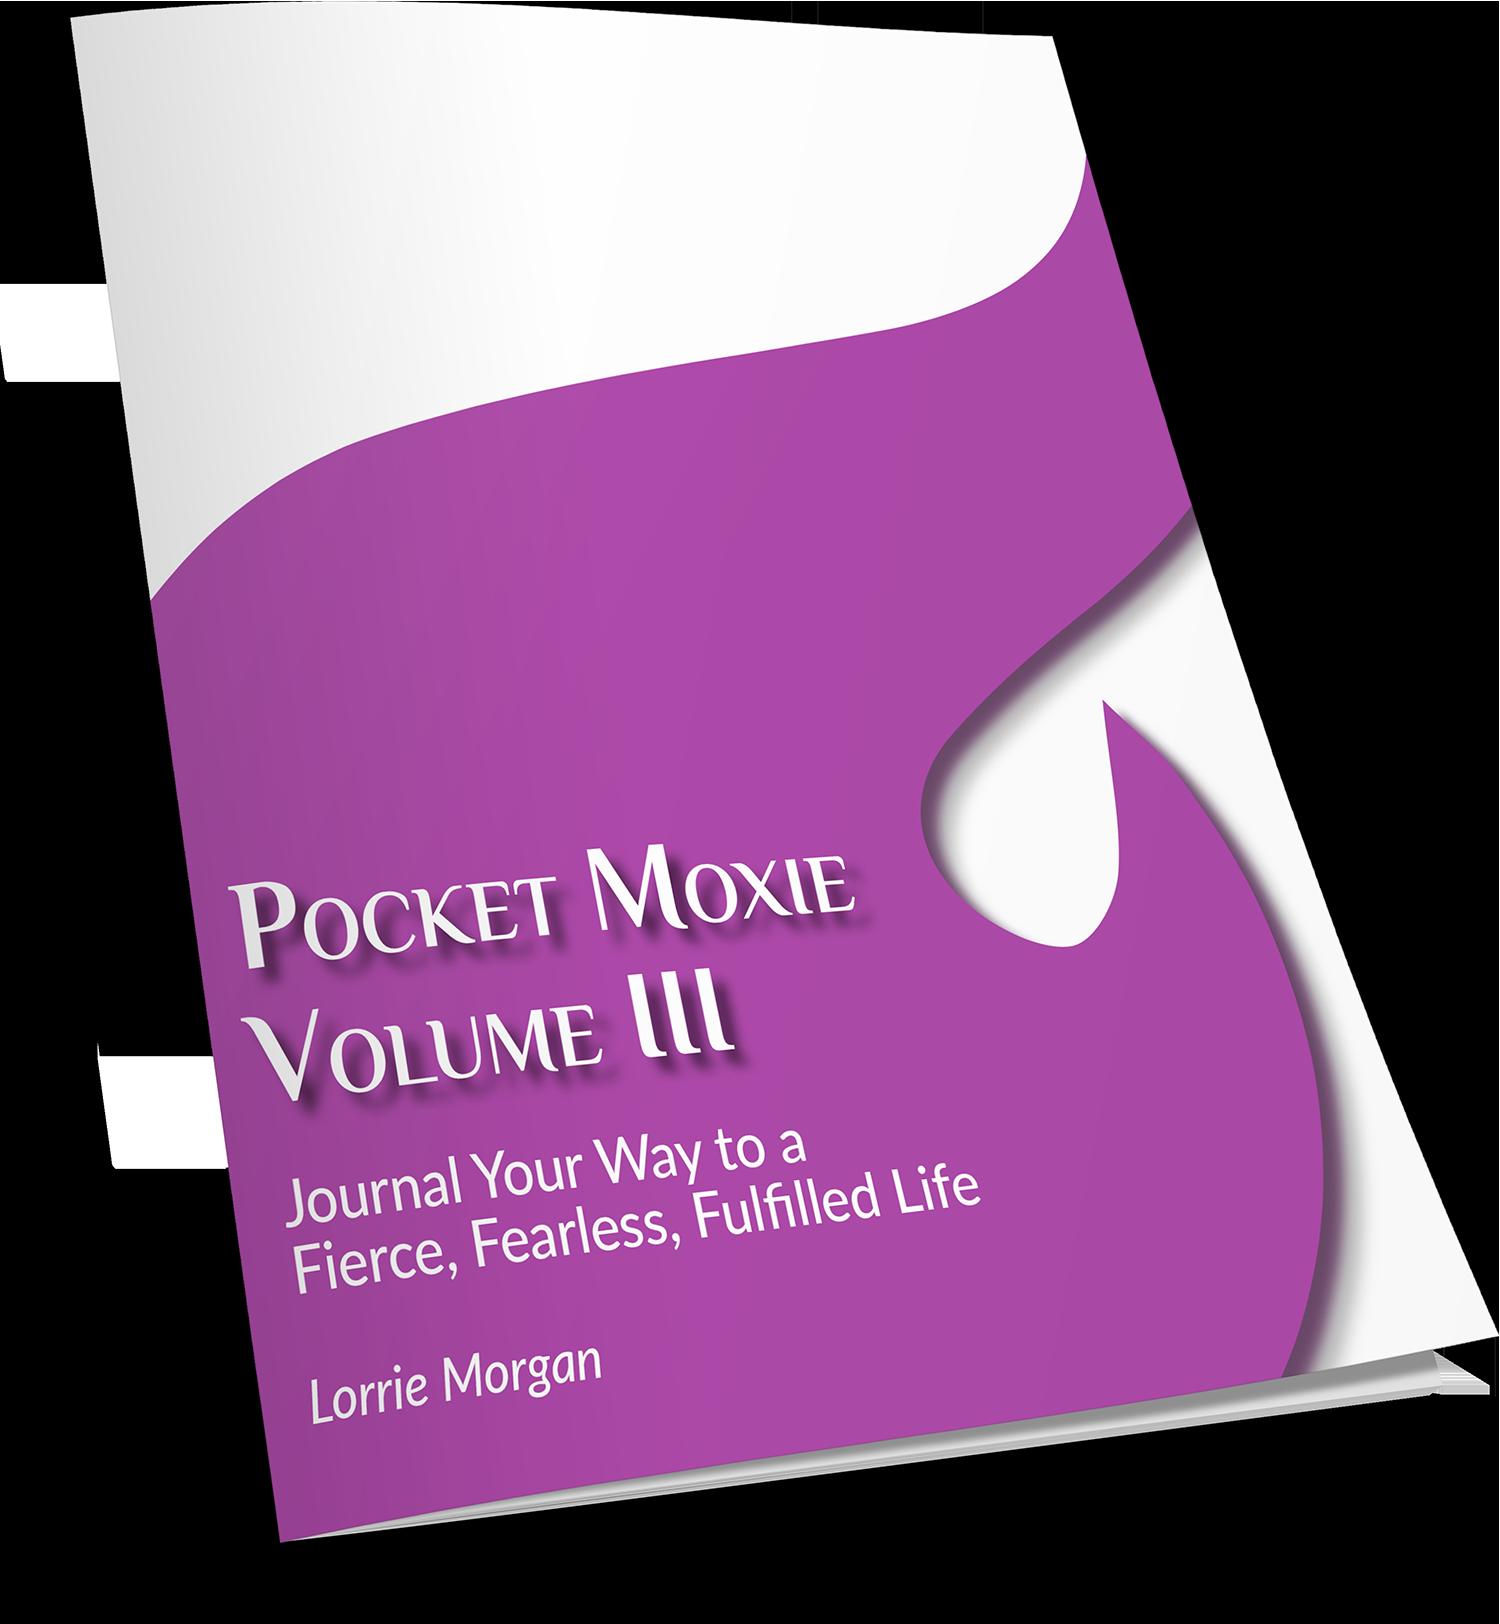 Pocket Moxie V3